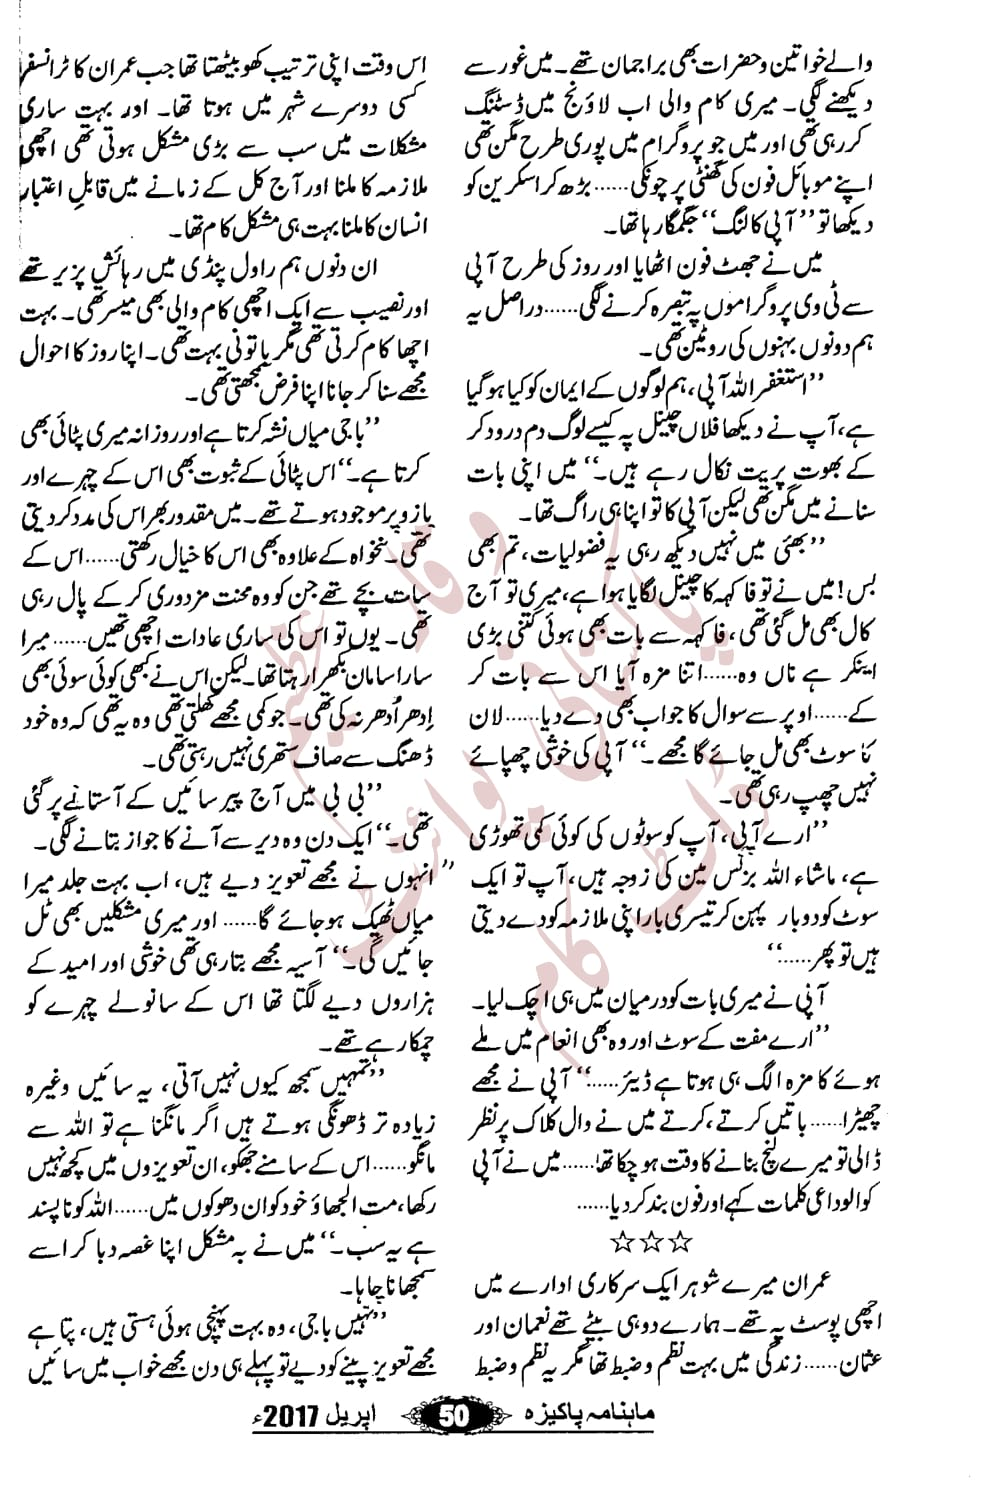 Free Urdu Digests: Raaz hasti novel by Tayyaba Ansar